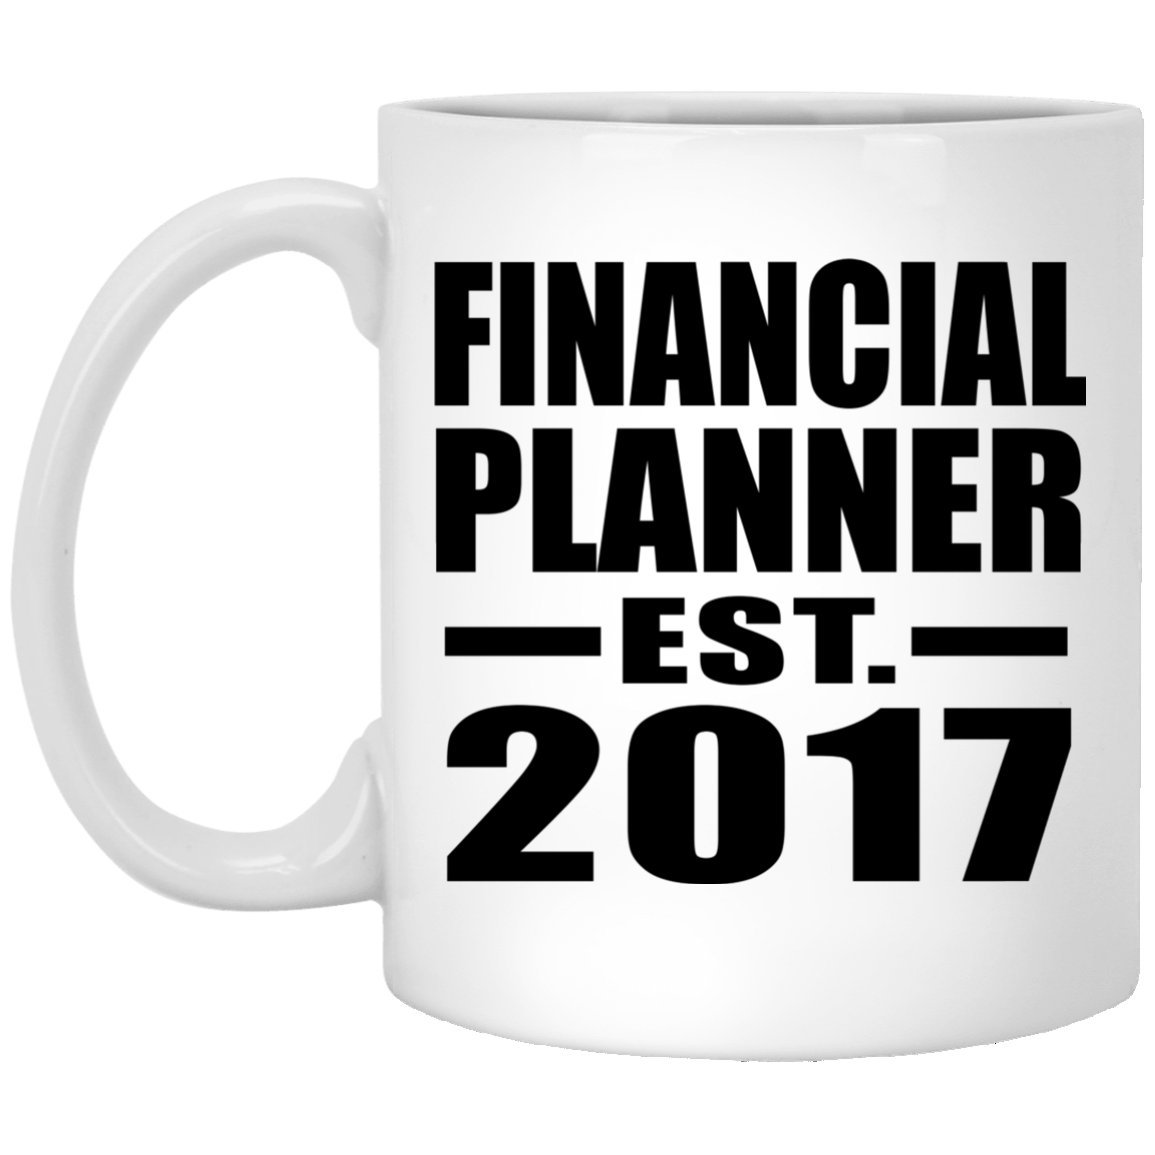 Amazon Designsify Financial Planner Established EST